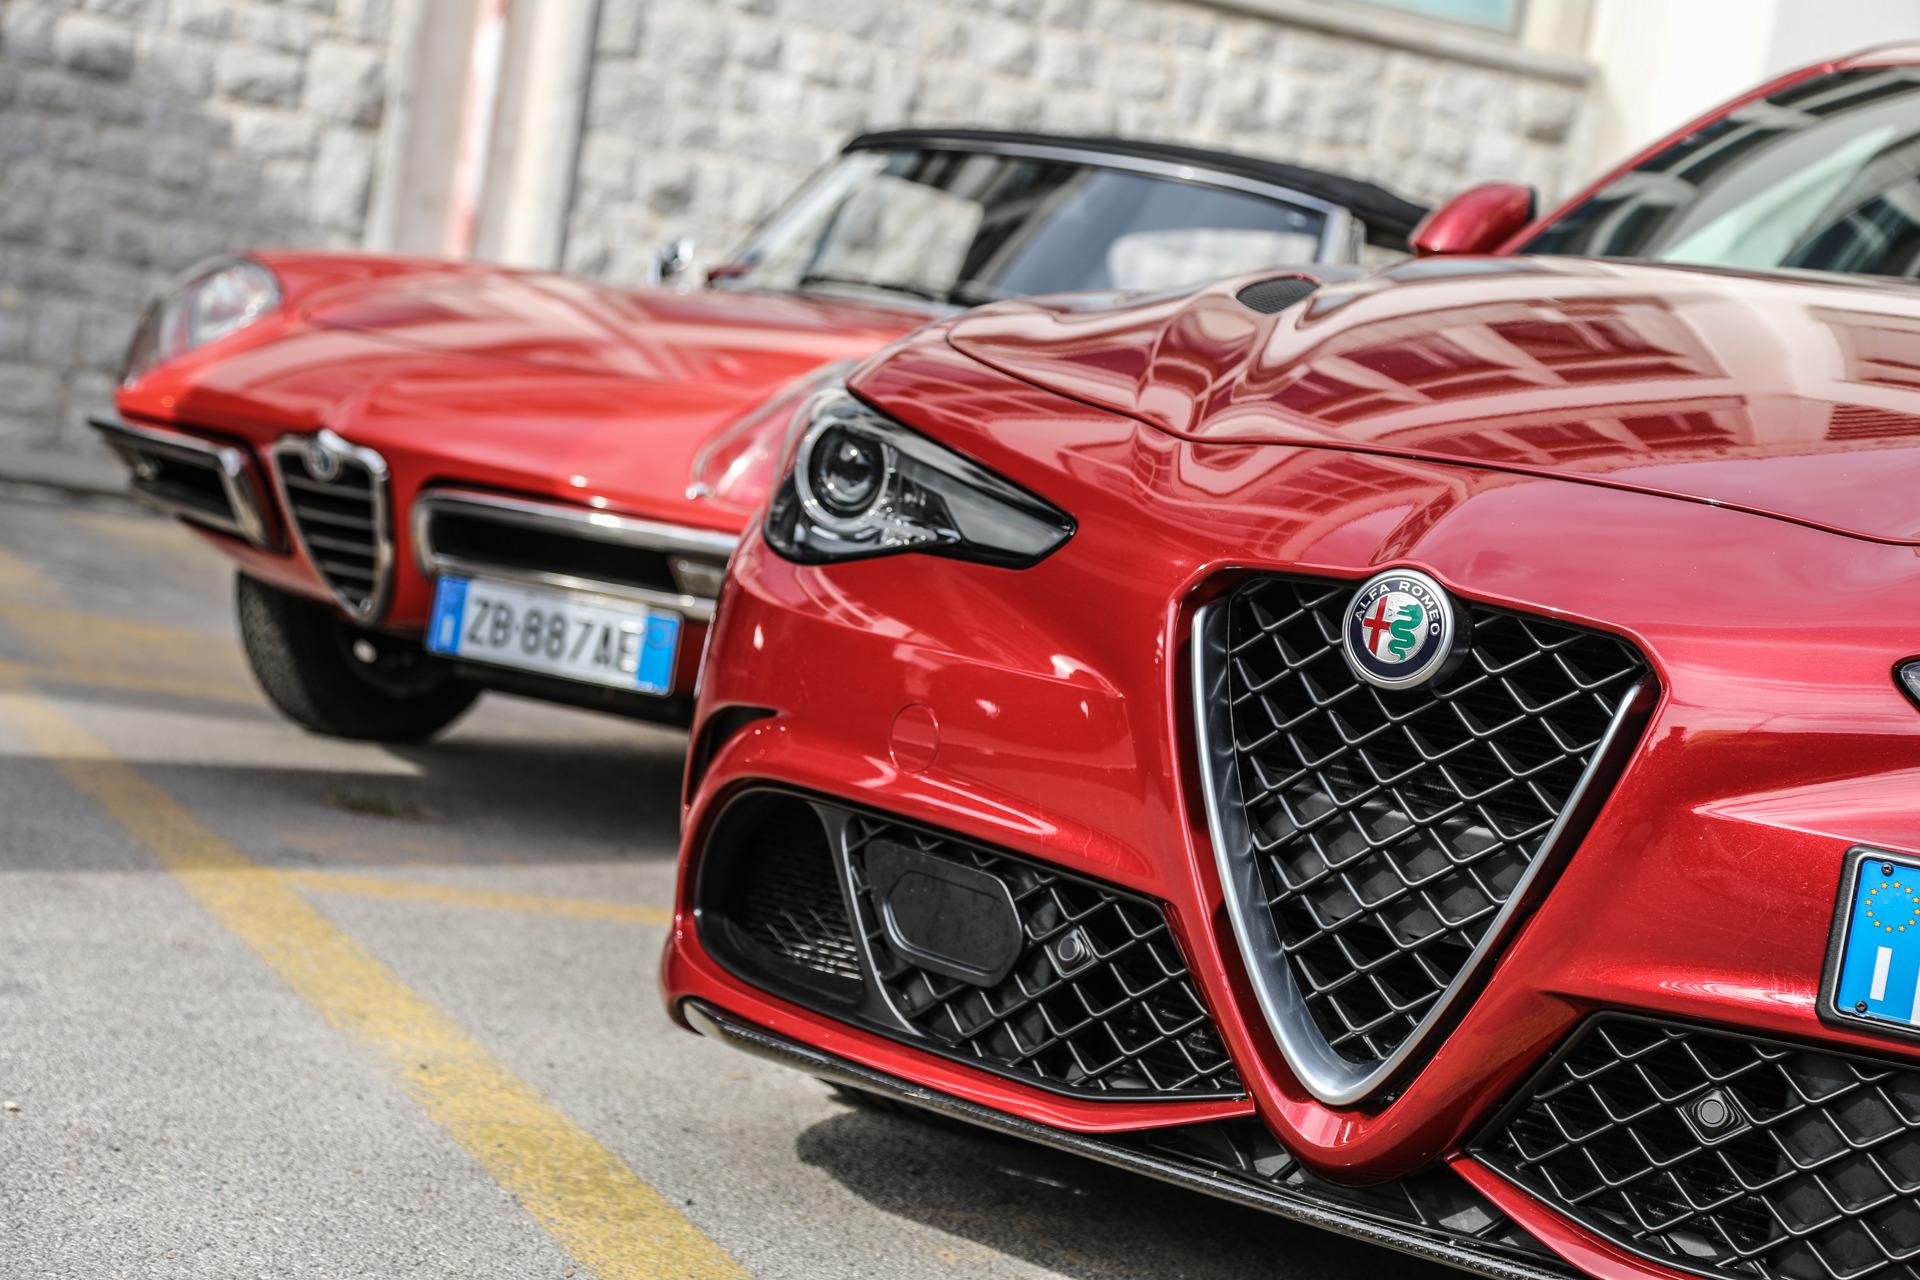 170420_Alfa-Romeo_On-Air_02.jpg